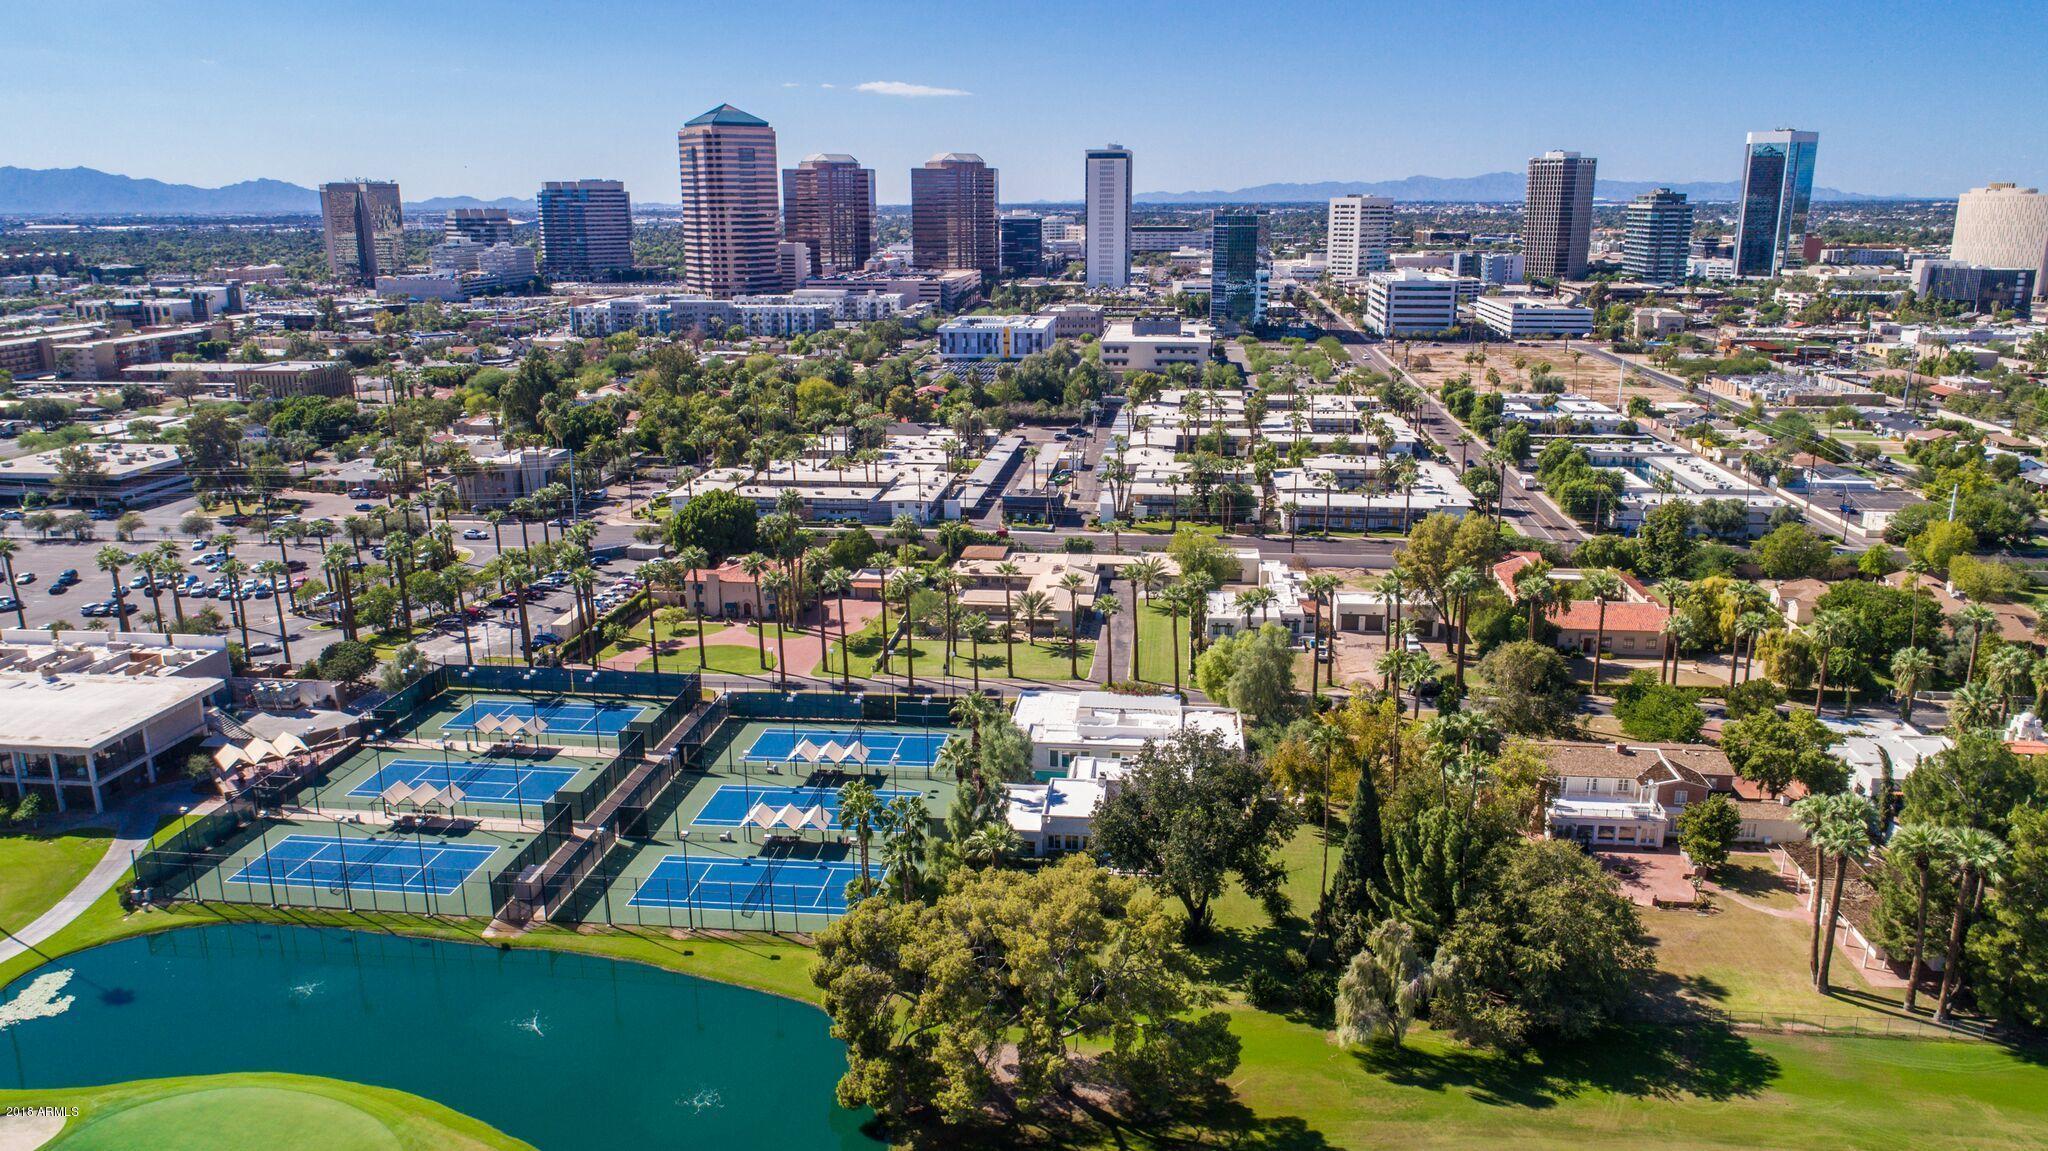 MLS 5836134 15 N COUNTRY CLUB Drive, Phoenix, AZ 85014 Phoenix AZ Gated